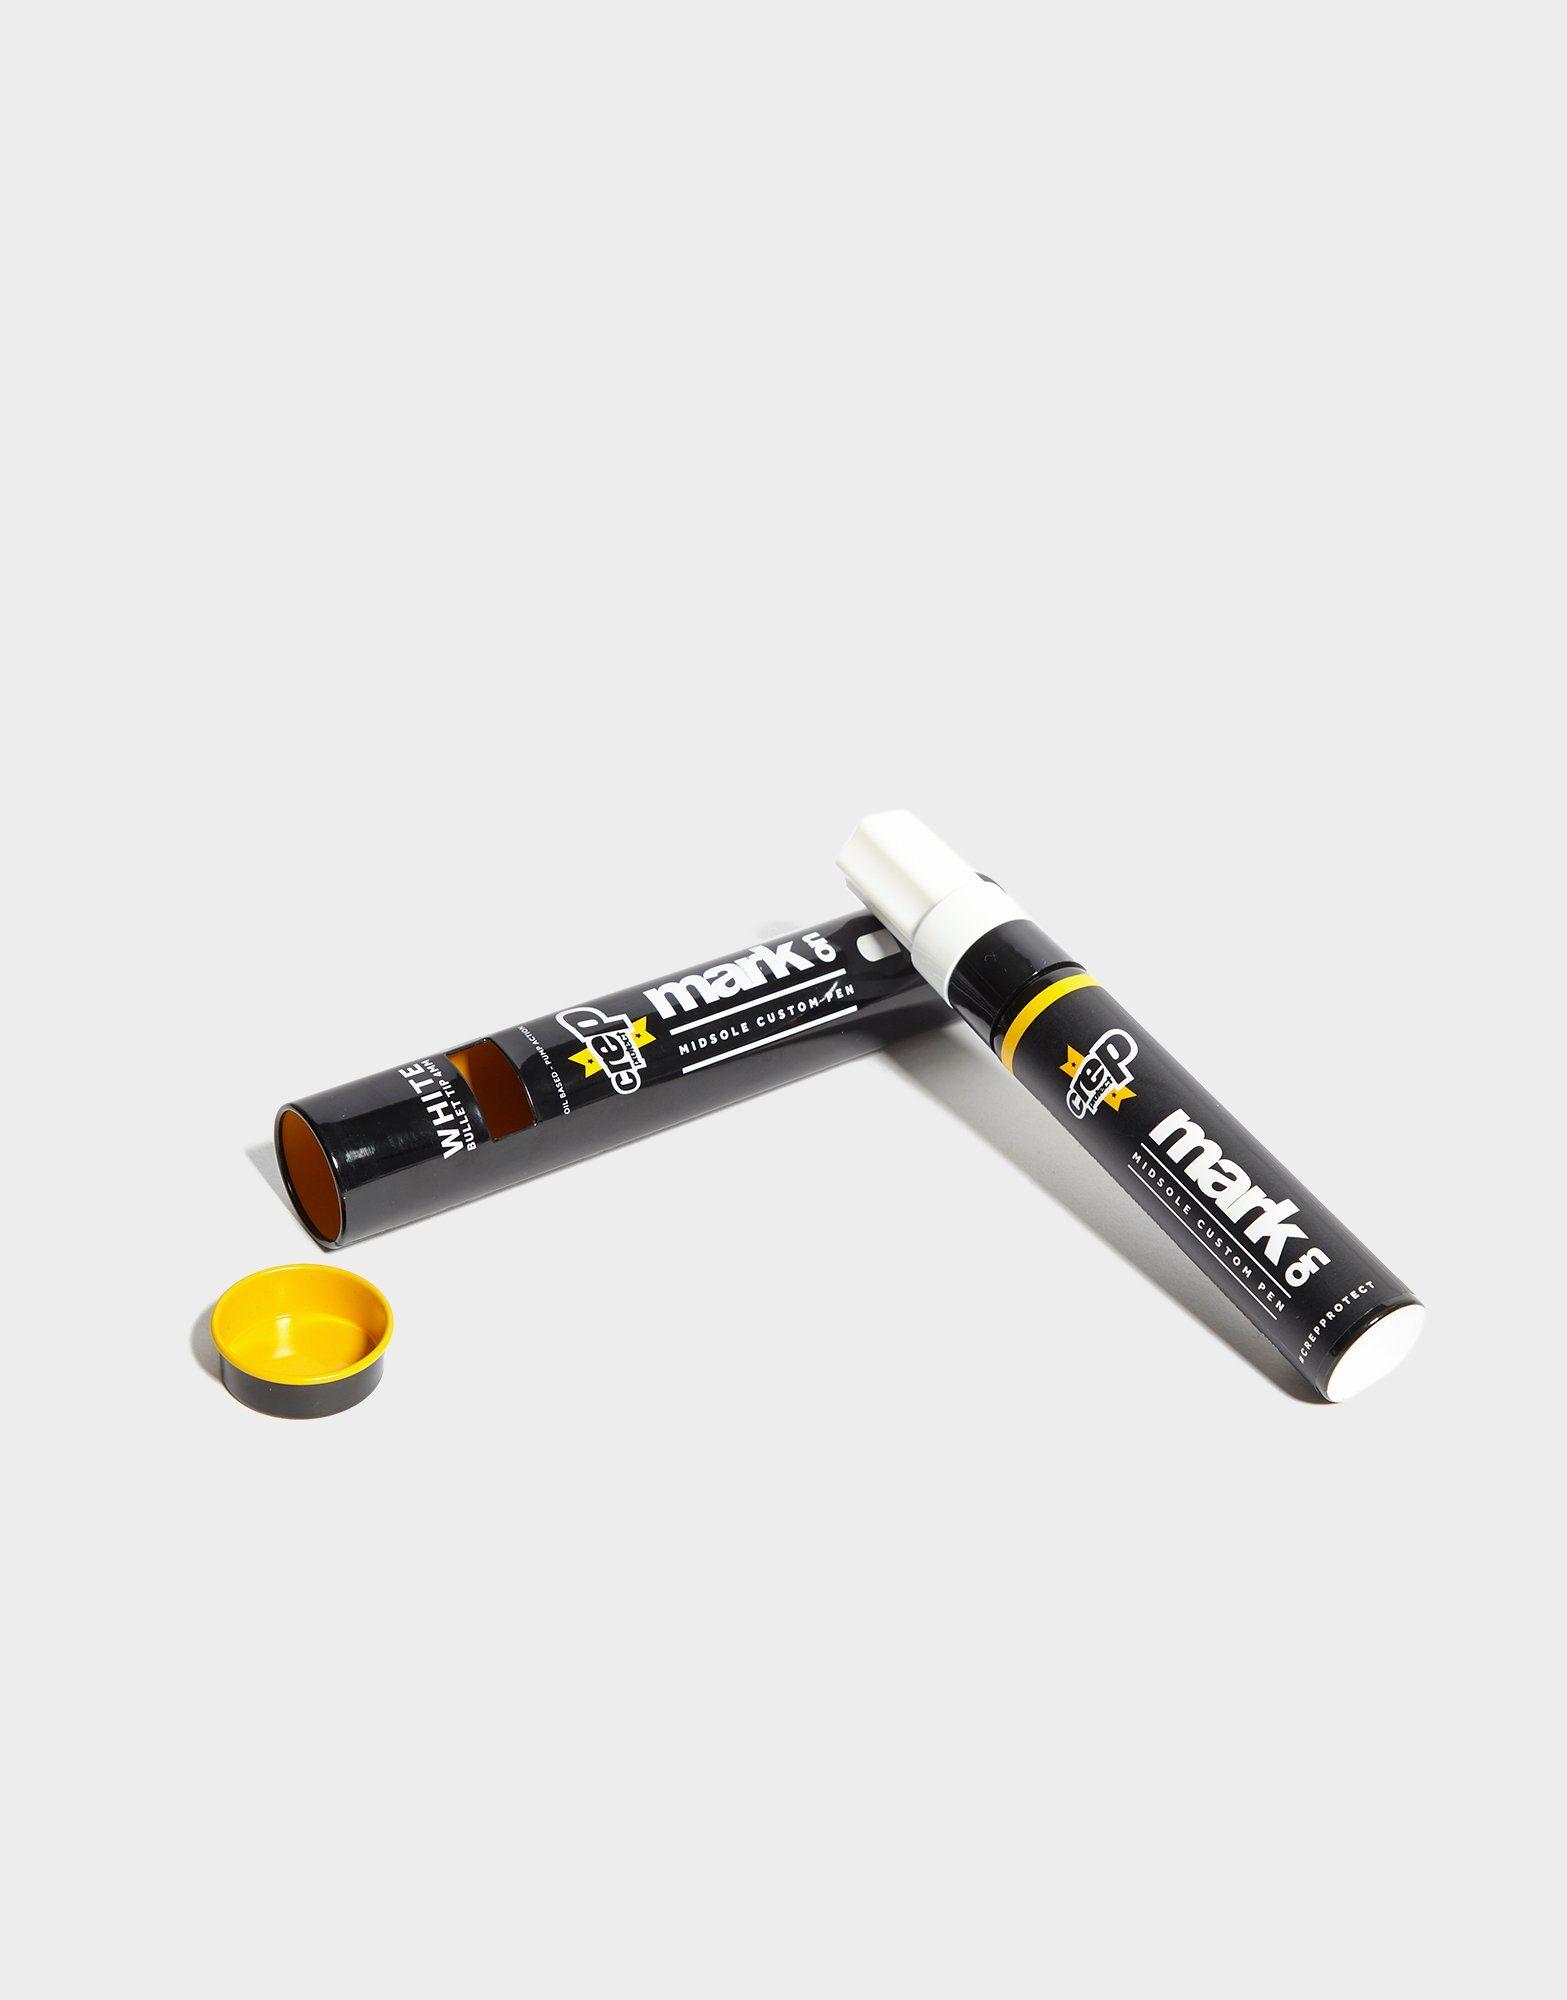 Crep Protect Midsole Marker Pen